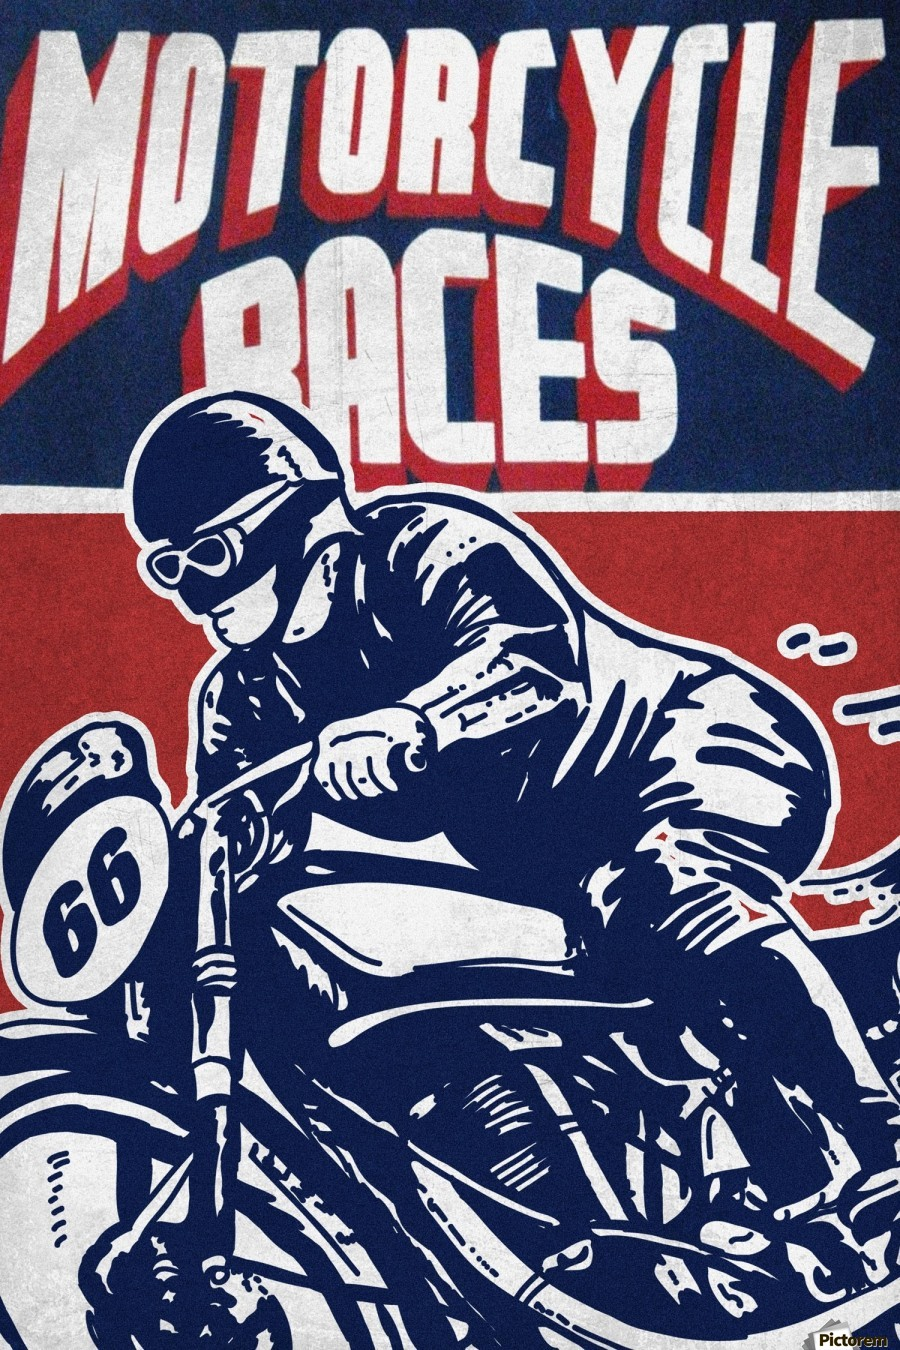 MR03 VINTAGE MOTORCYCLE BIKE RACES A2 POSTER PRINT